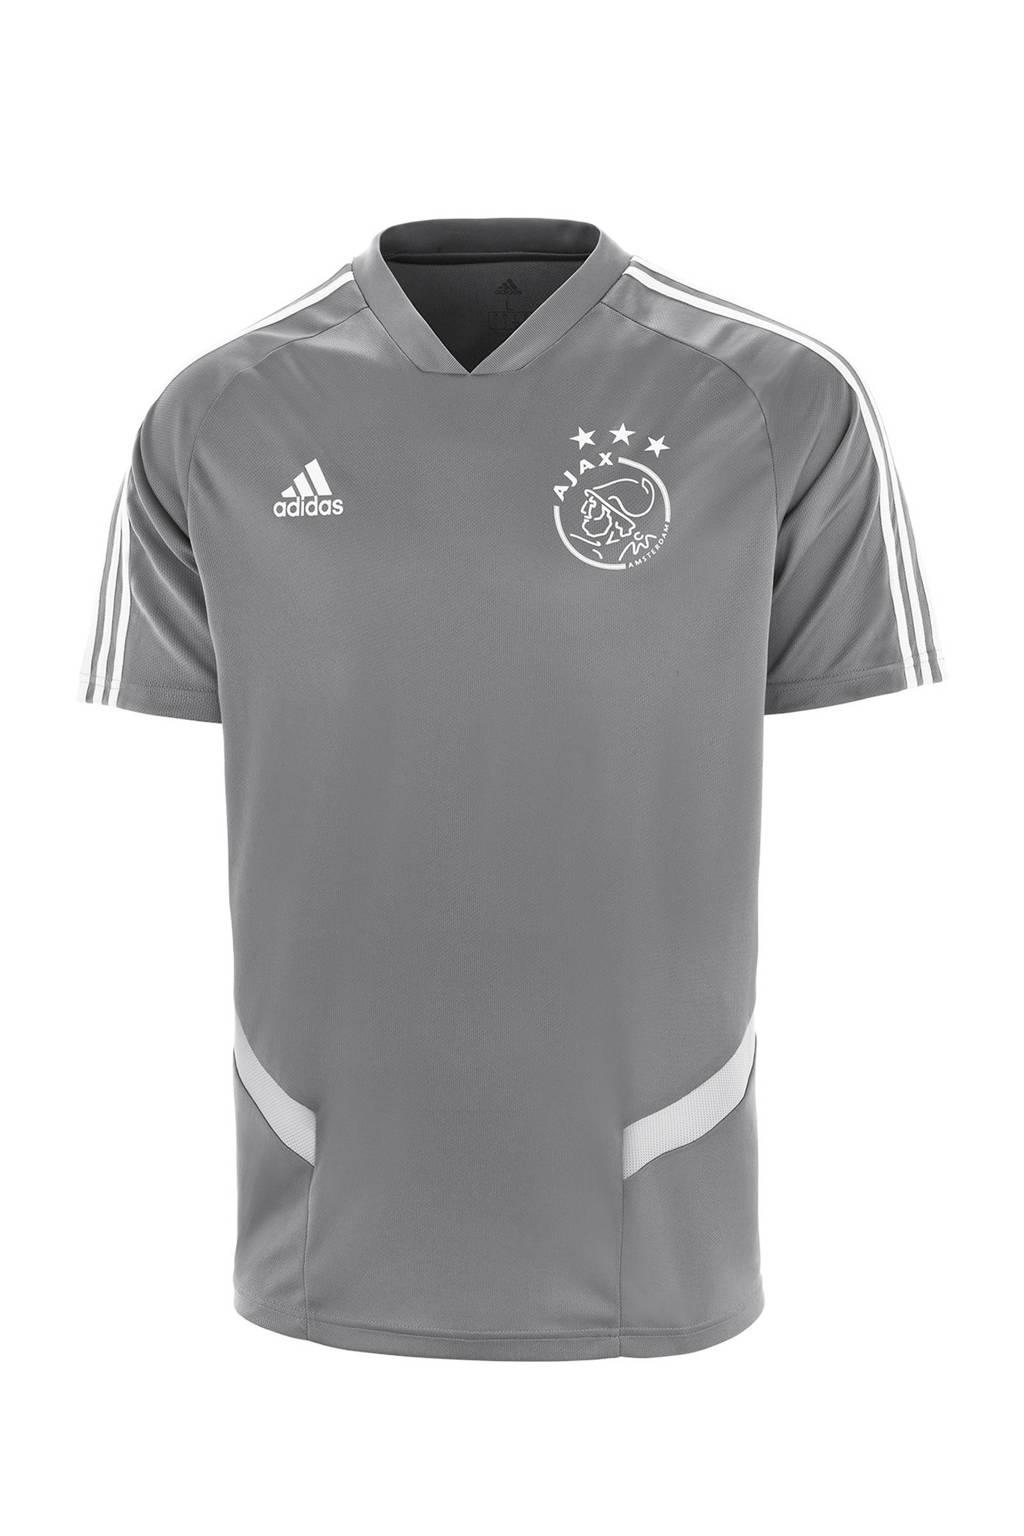 adidas Junior Ajax voetbalshirt Training, Grijs/wit